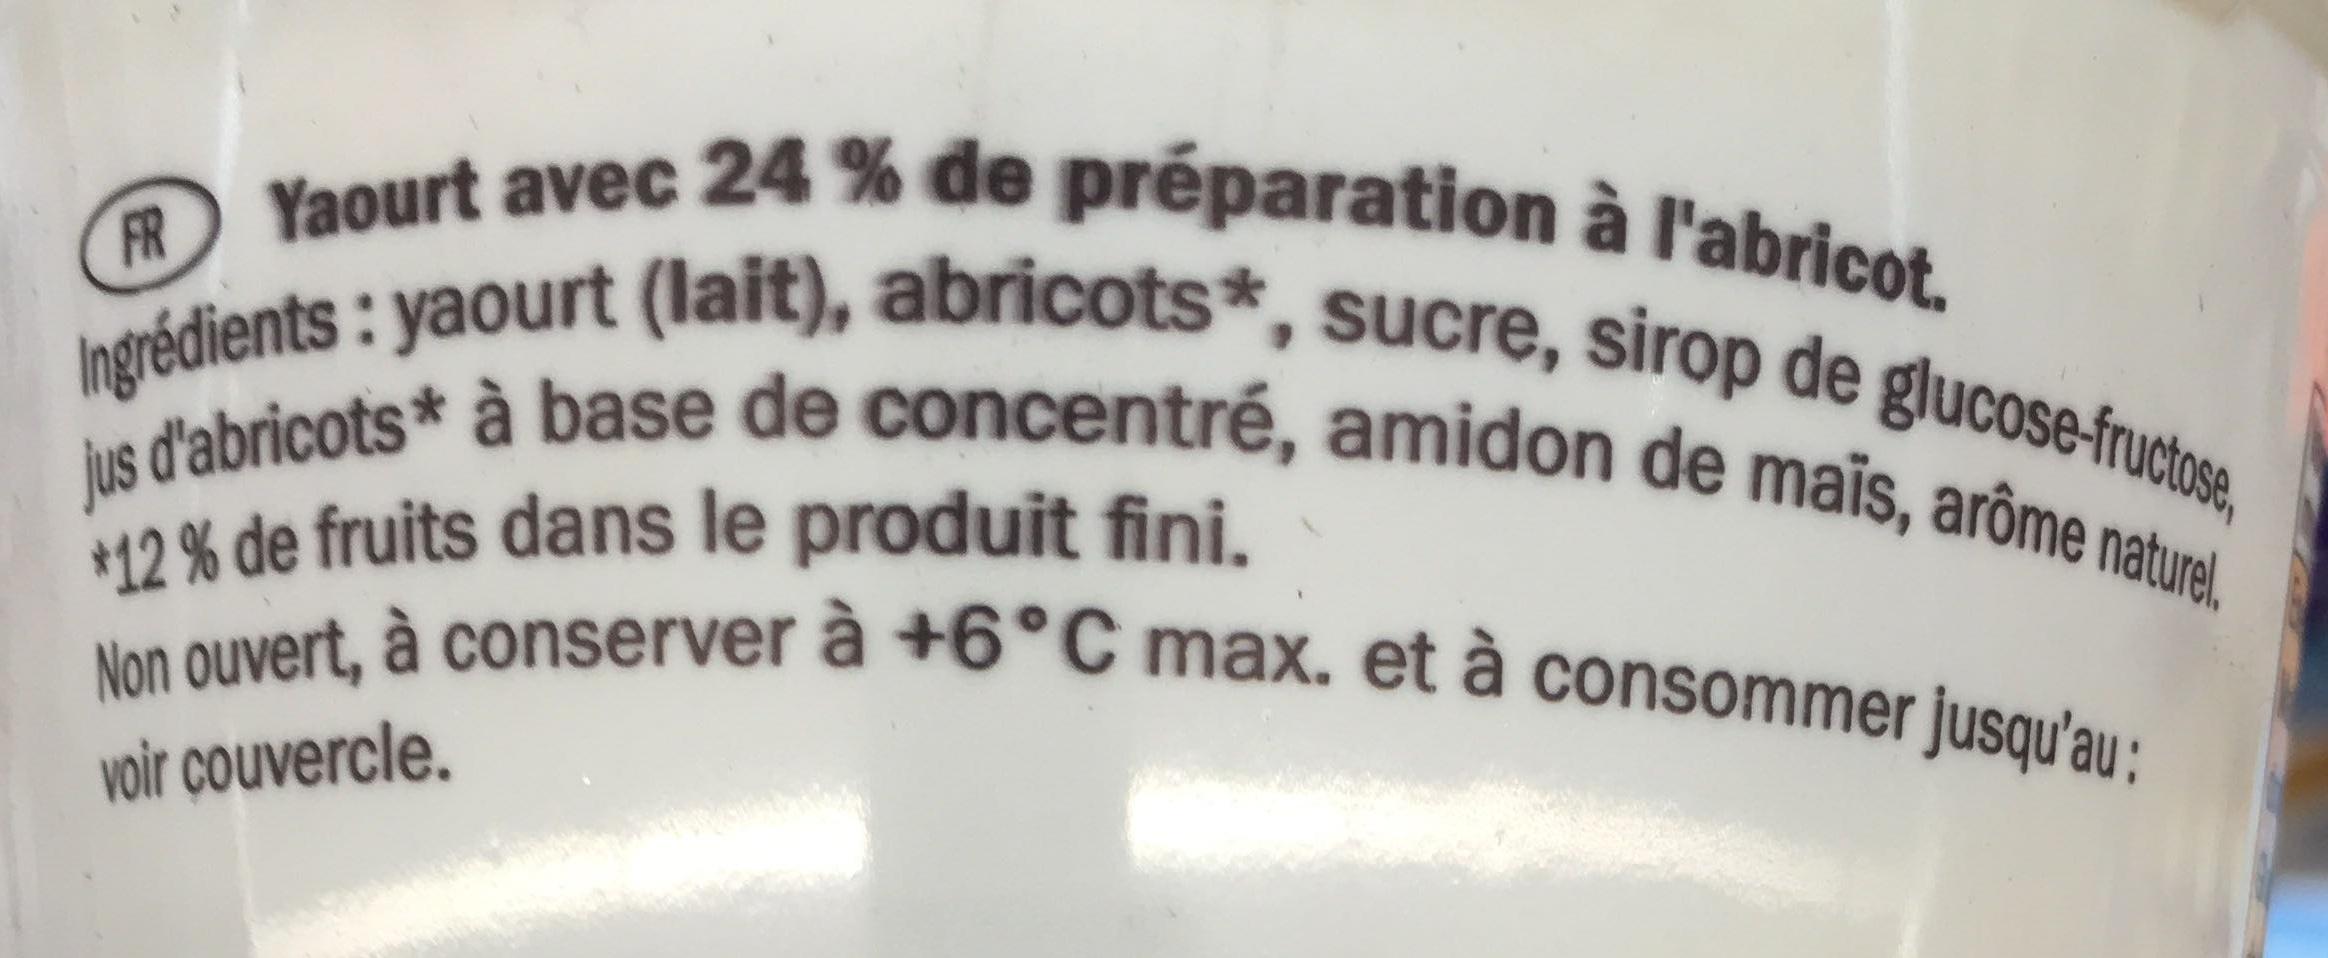 Yaourt abricot - Ingrédients - fr